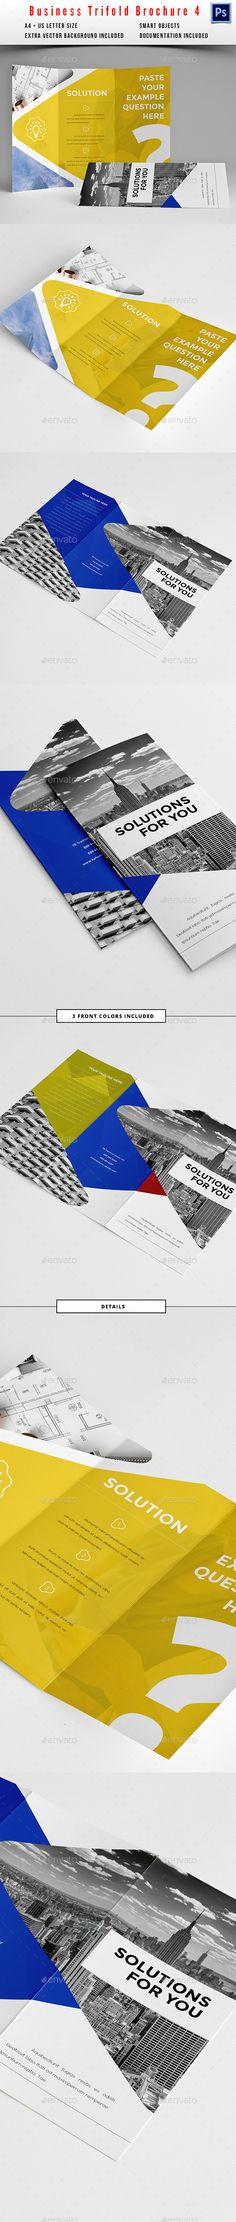 Clean Trifold Business Brochure 4 Business BrochureBrochure